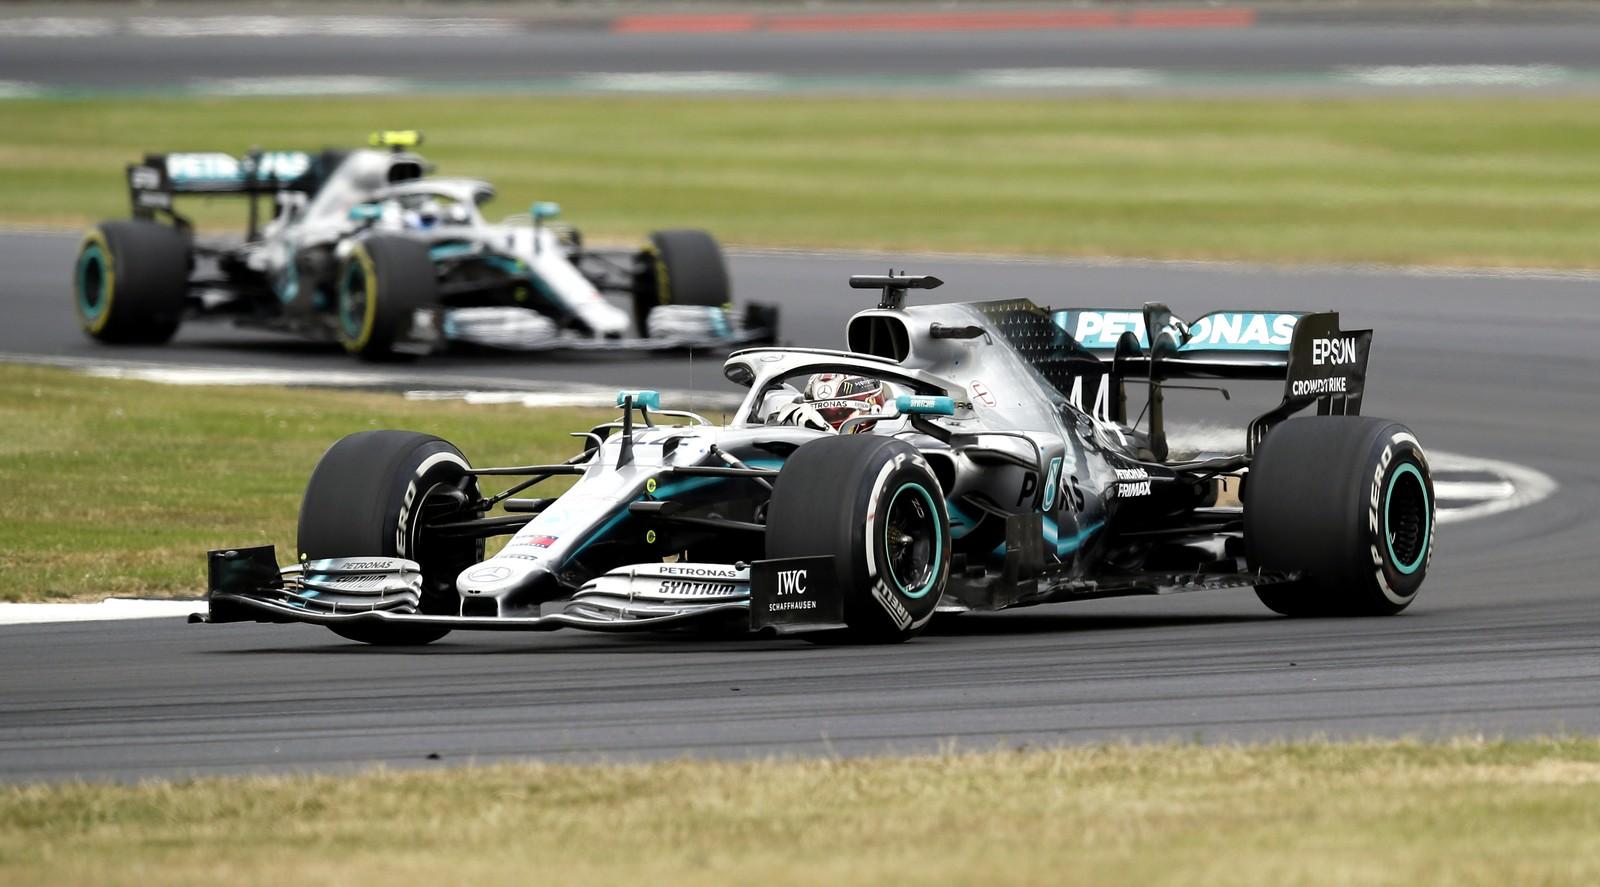 Hamilton vence pela 80ª vez na Fórmula 1